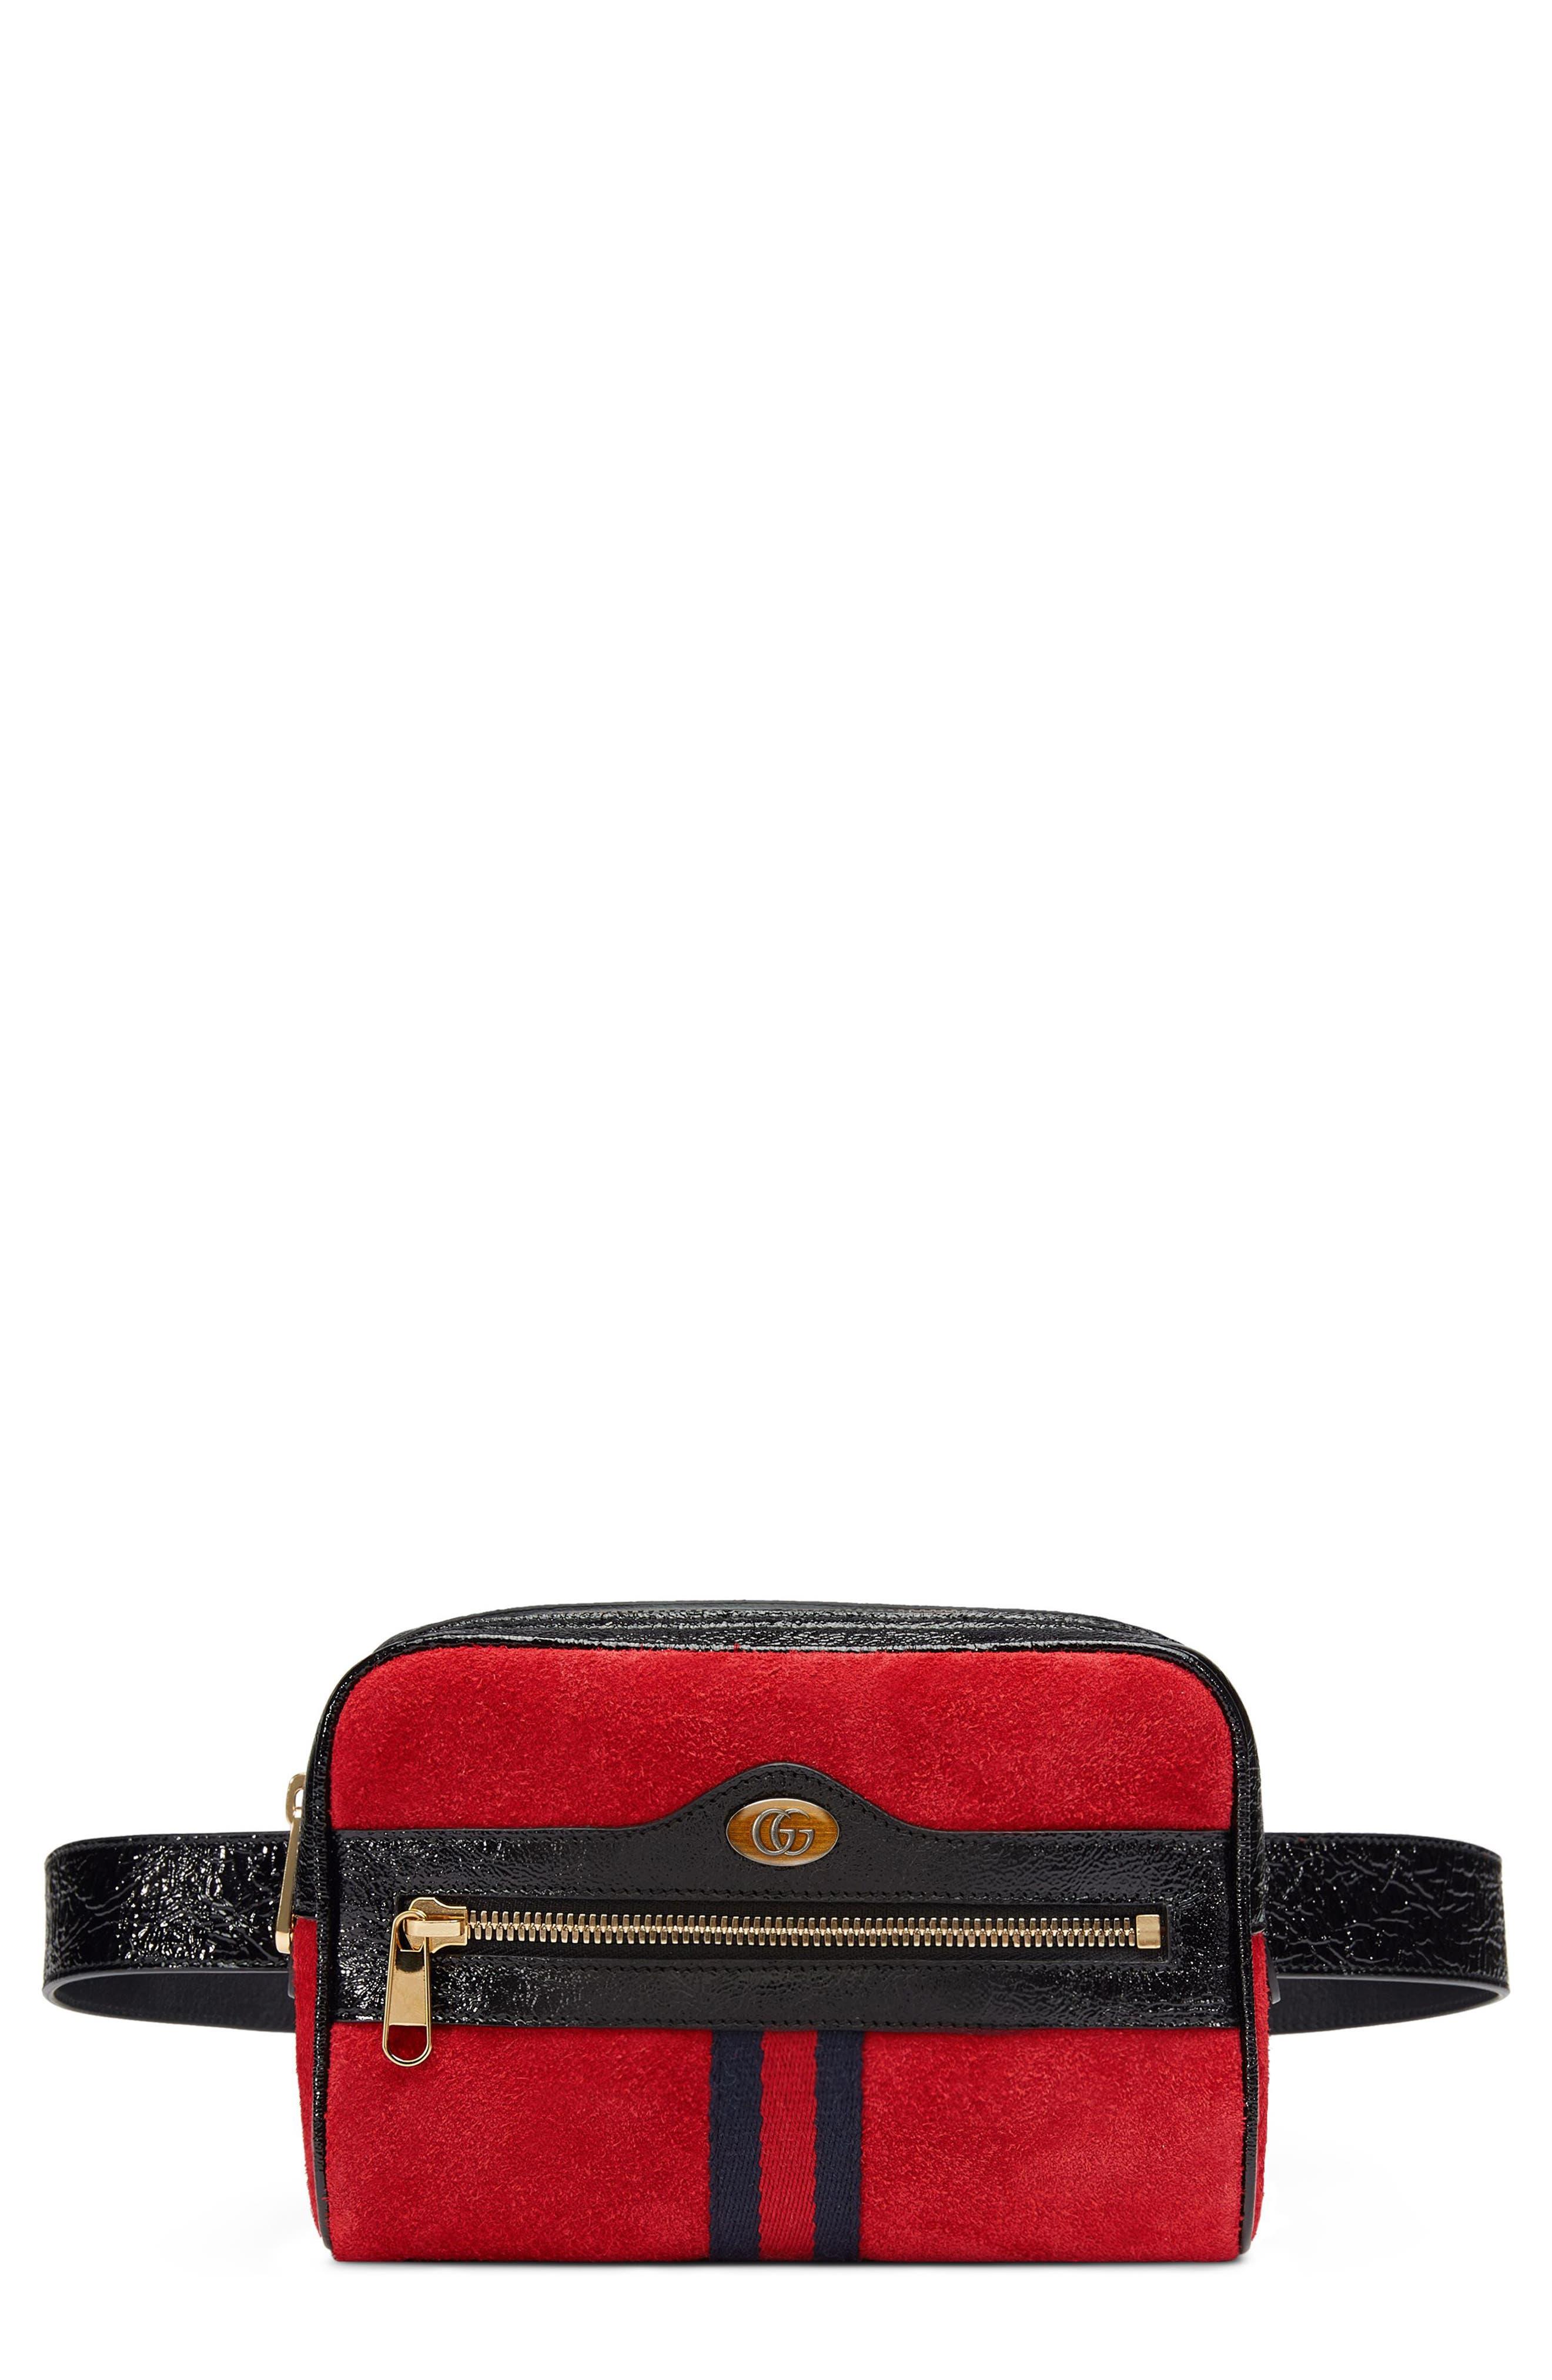 d9e7e133125 Red Belt Bags   Fanny Packs